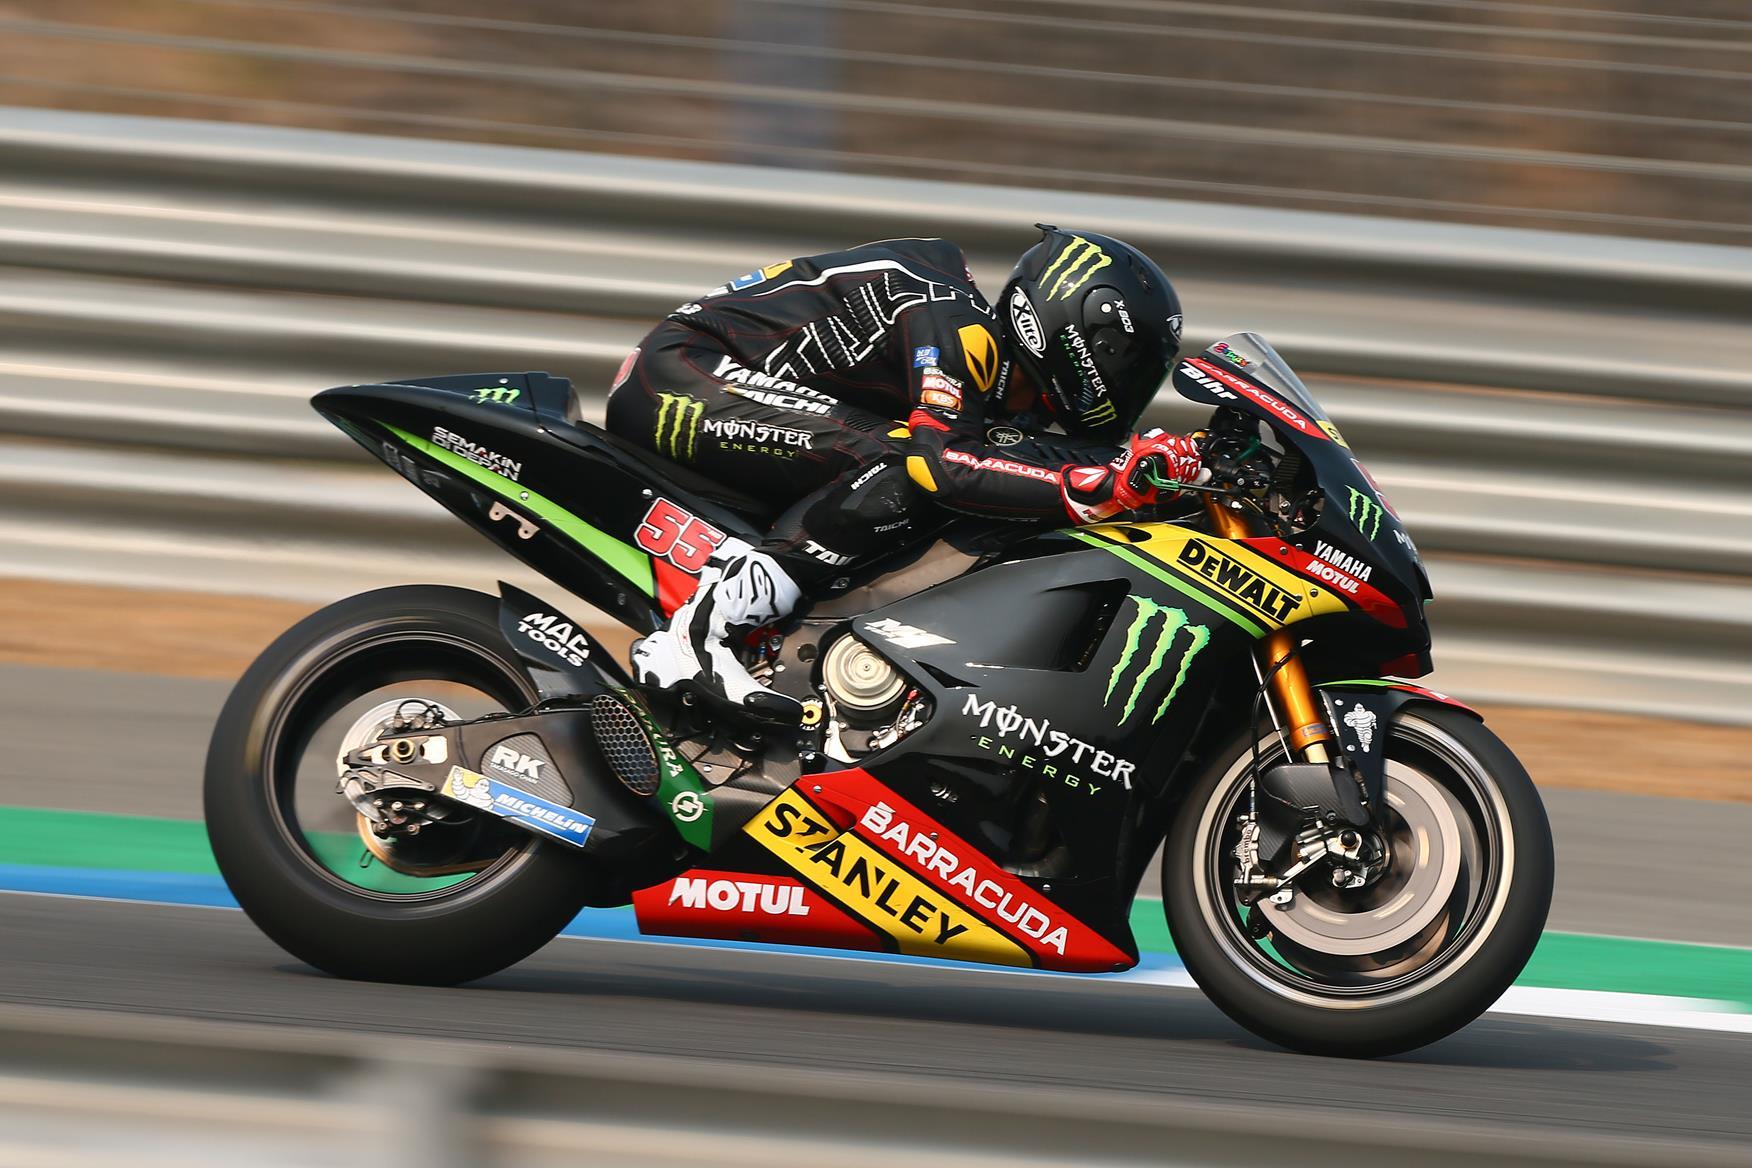 Motorcycling-Malaysian Syahrin to race for Tech3 Yamaha…